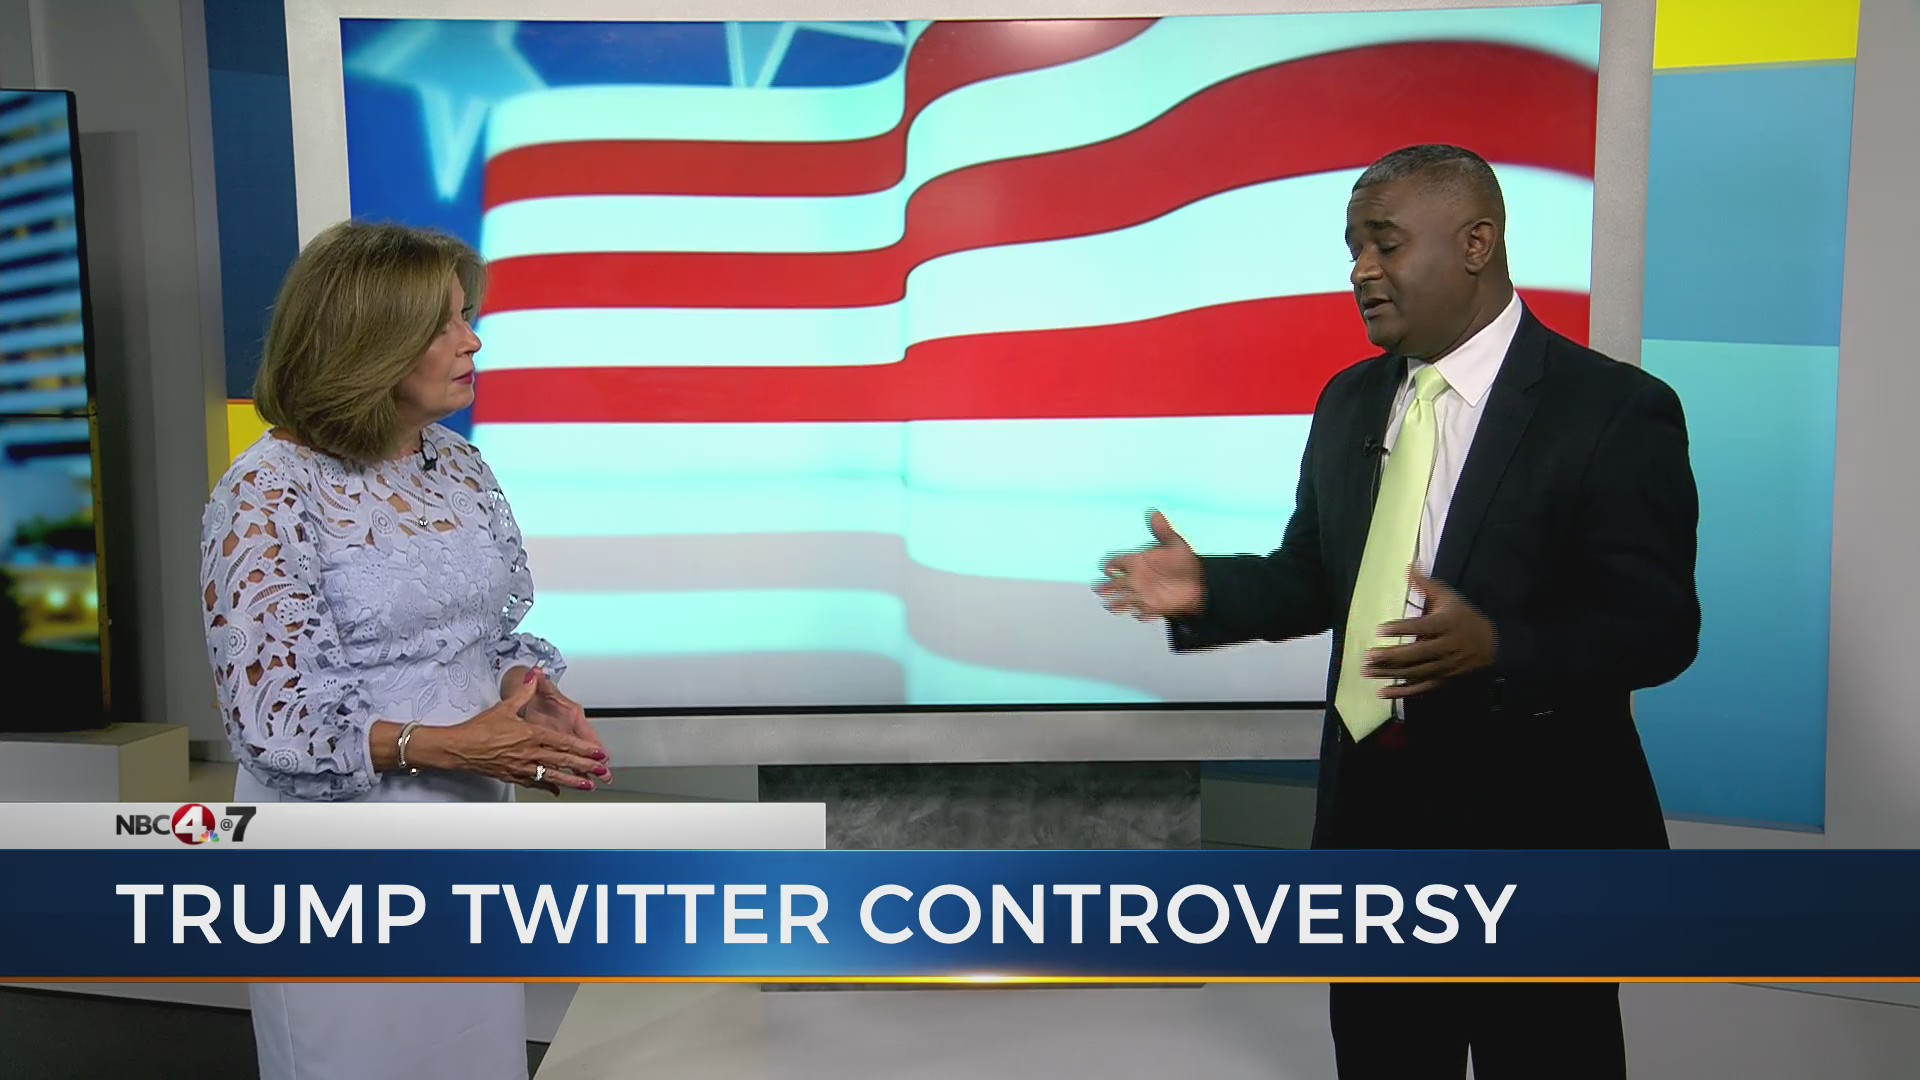 ANALYSIS: Trump tweets racist, un-American, says former